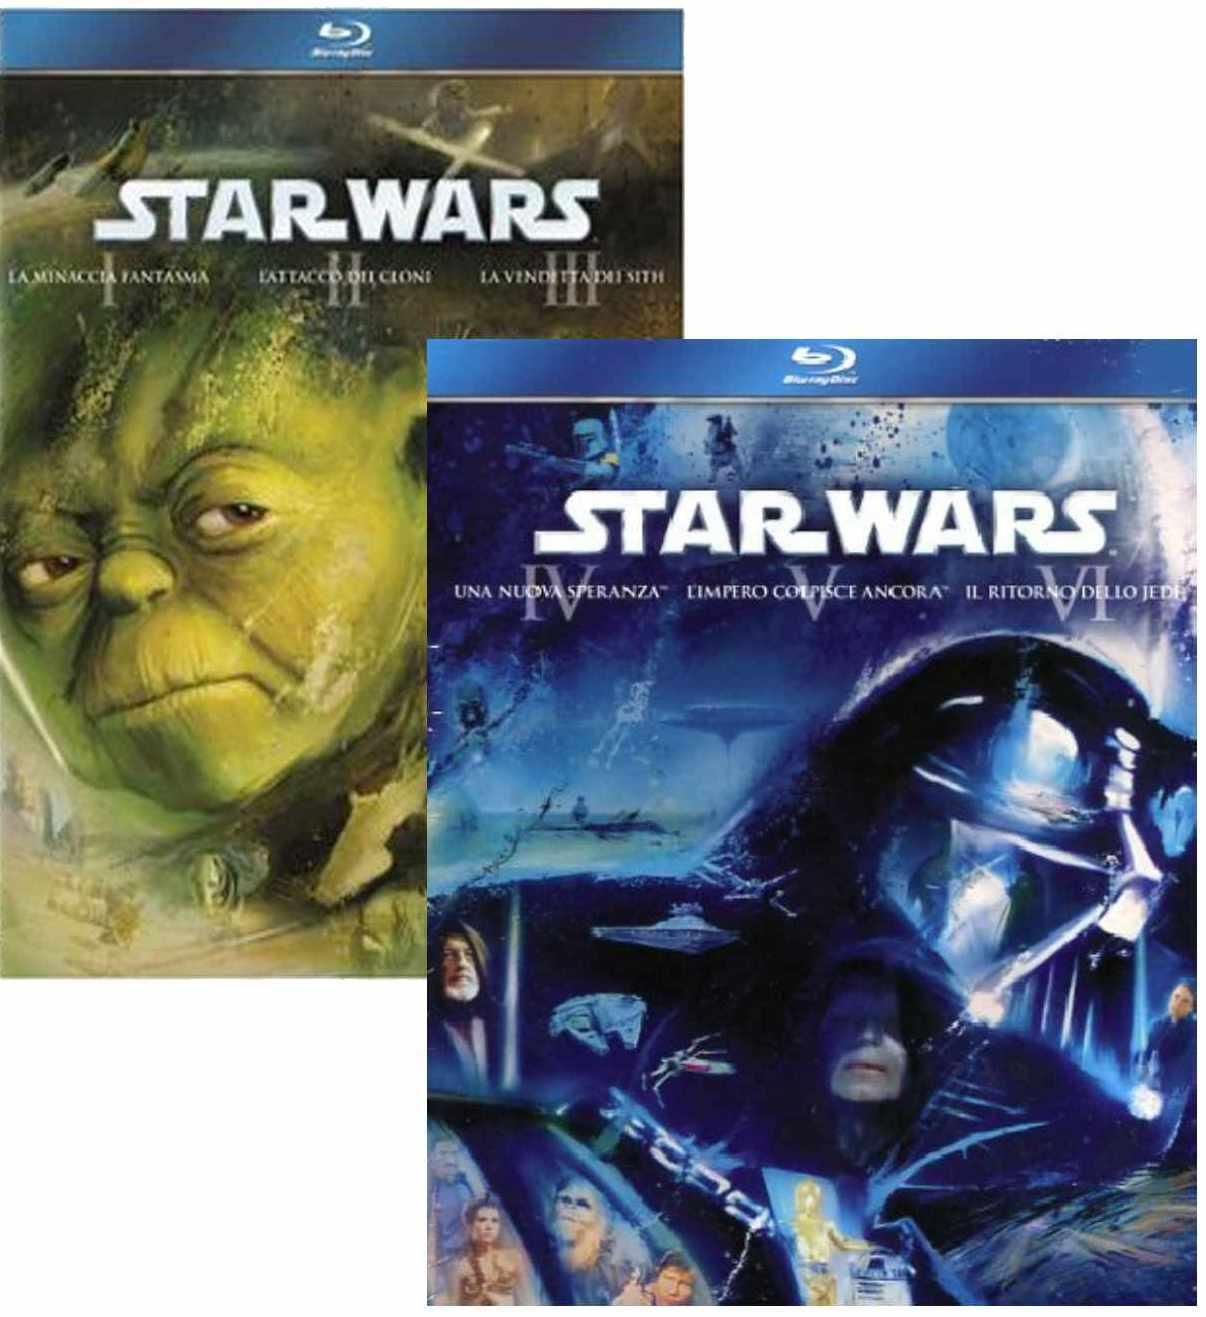 STAR WARS 1-6 KOMPLETNÍ SÁGA (9 BD) - Blu-ray